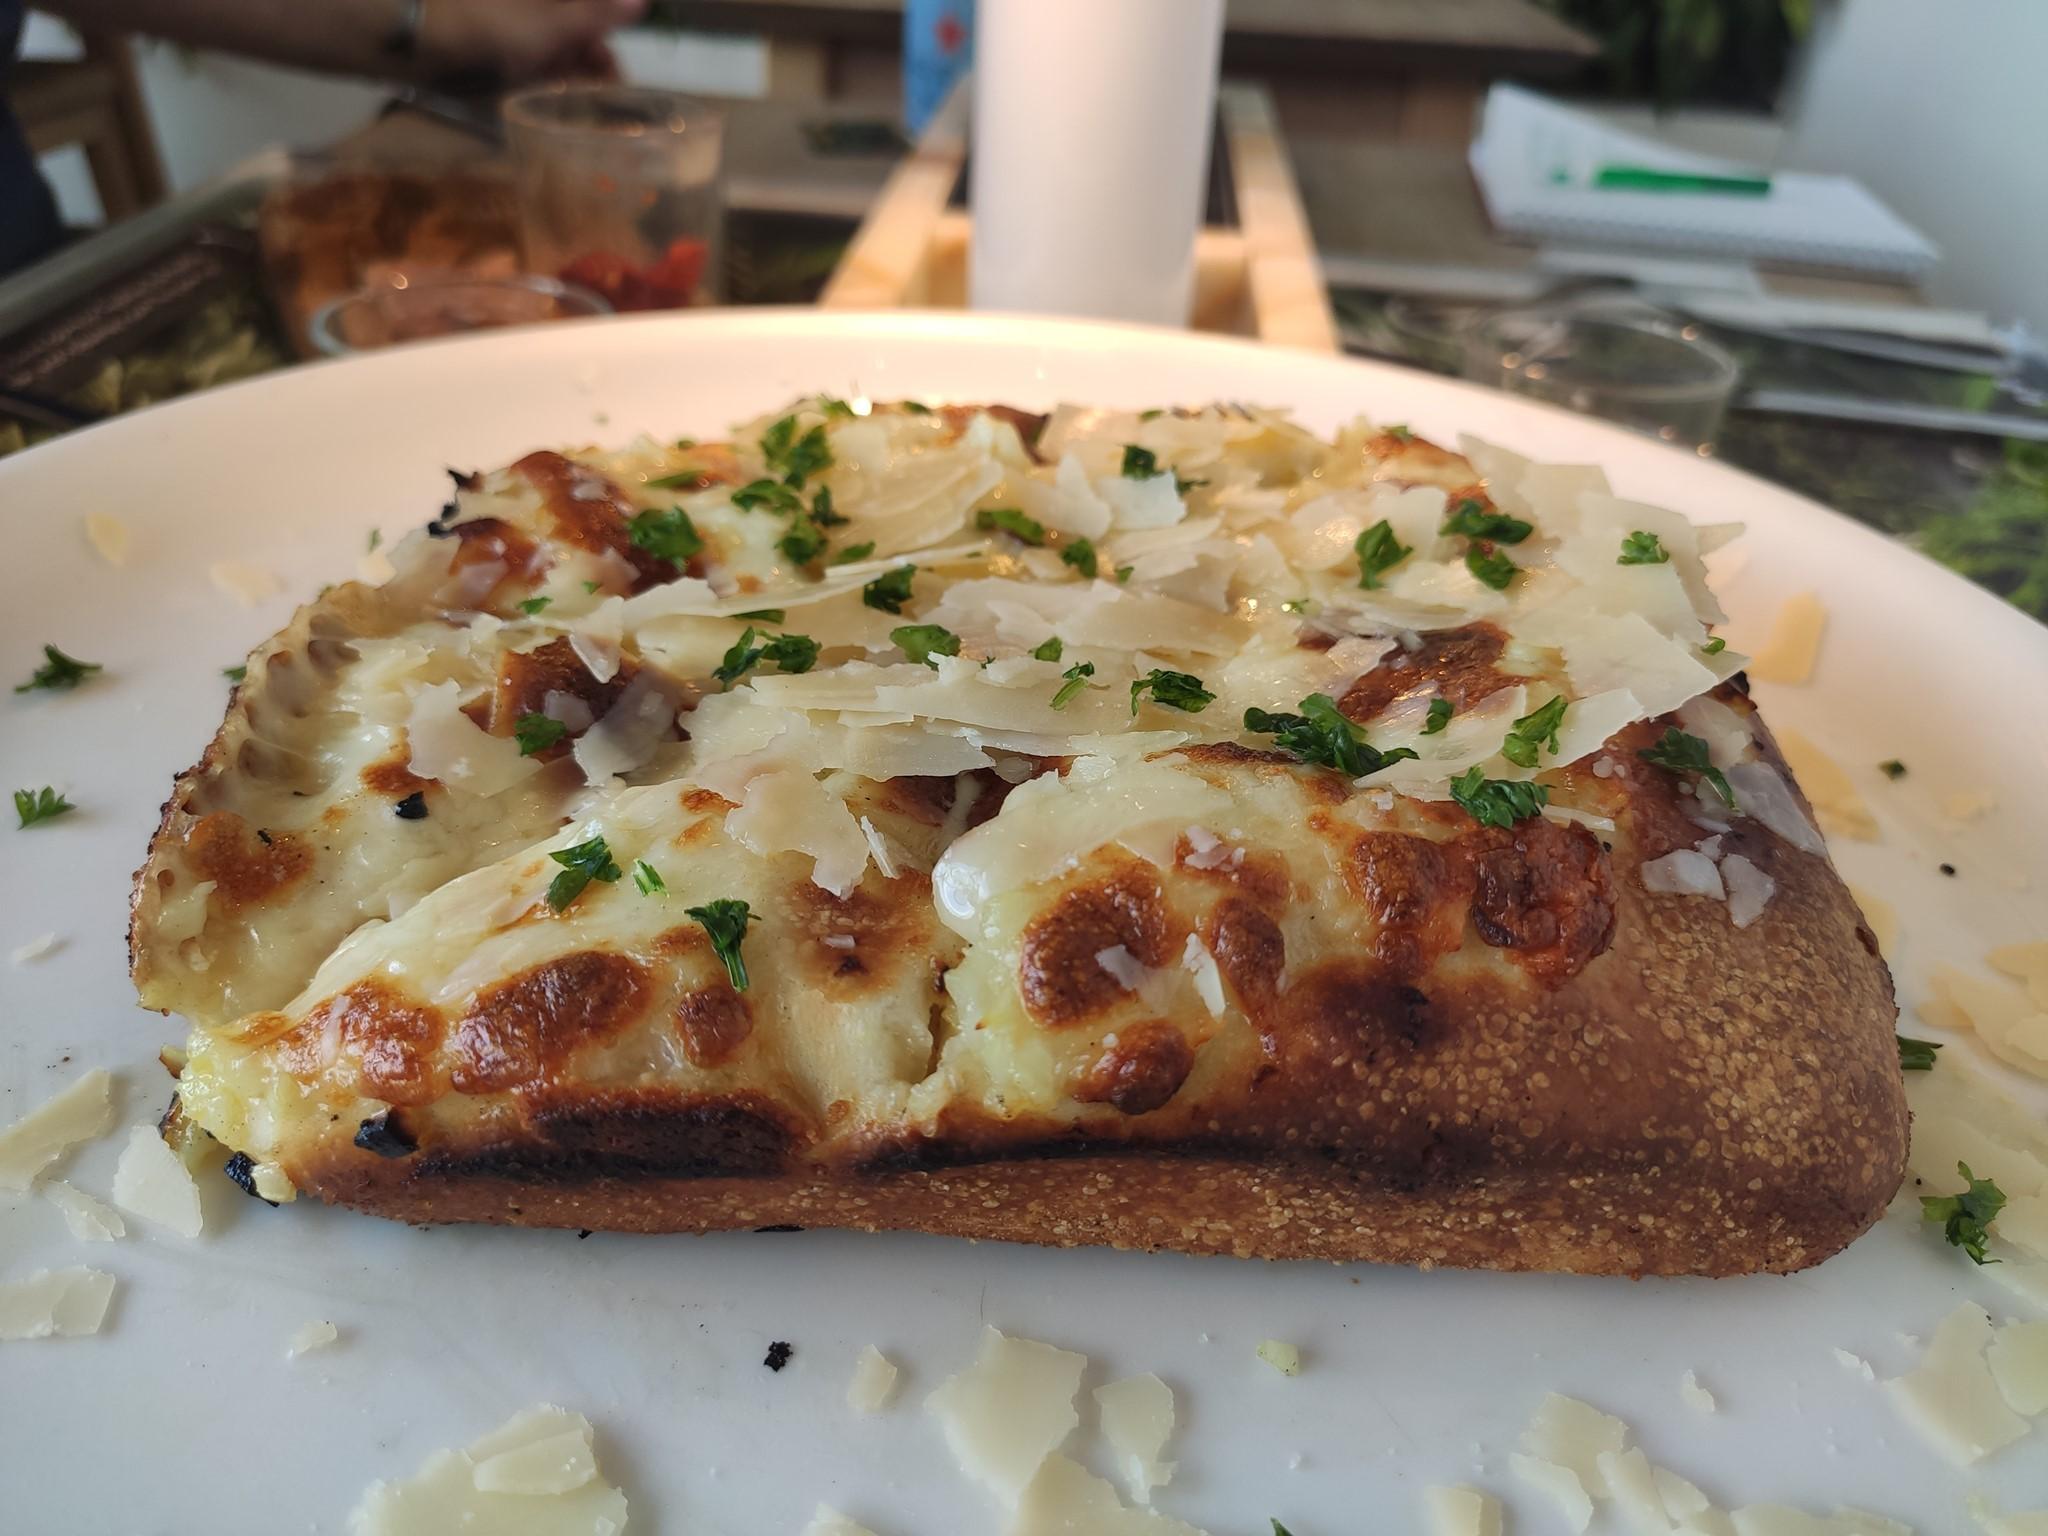 Vapiano - Garlic Bread